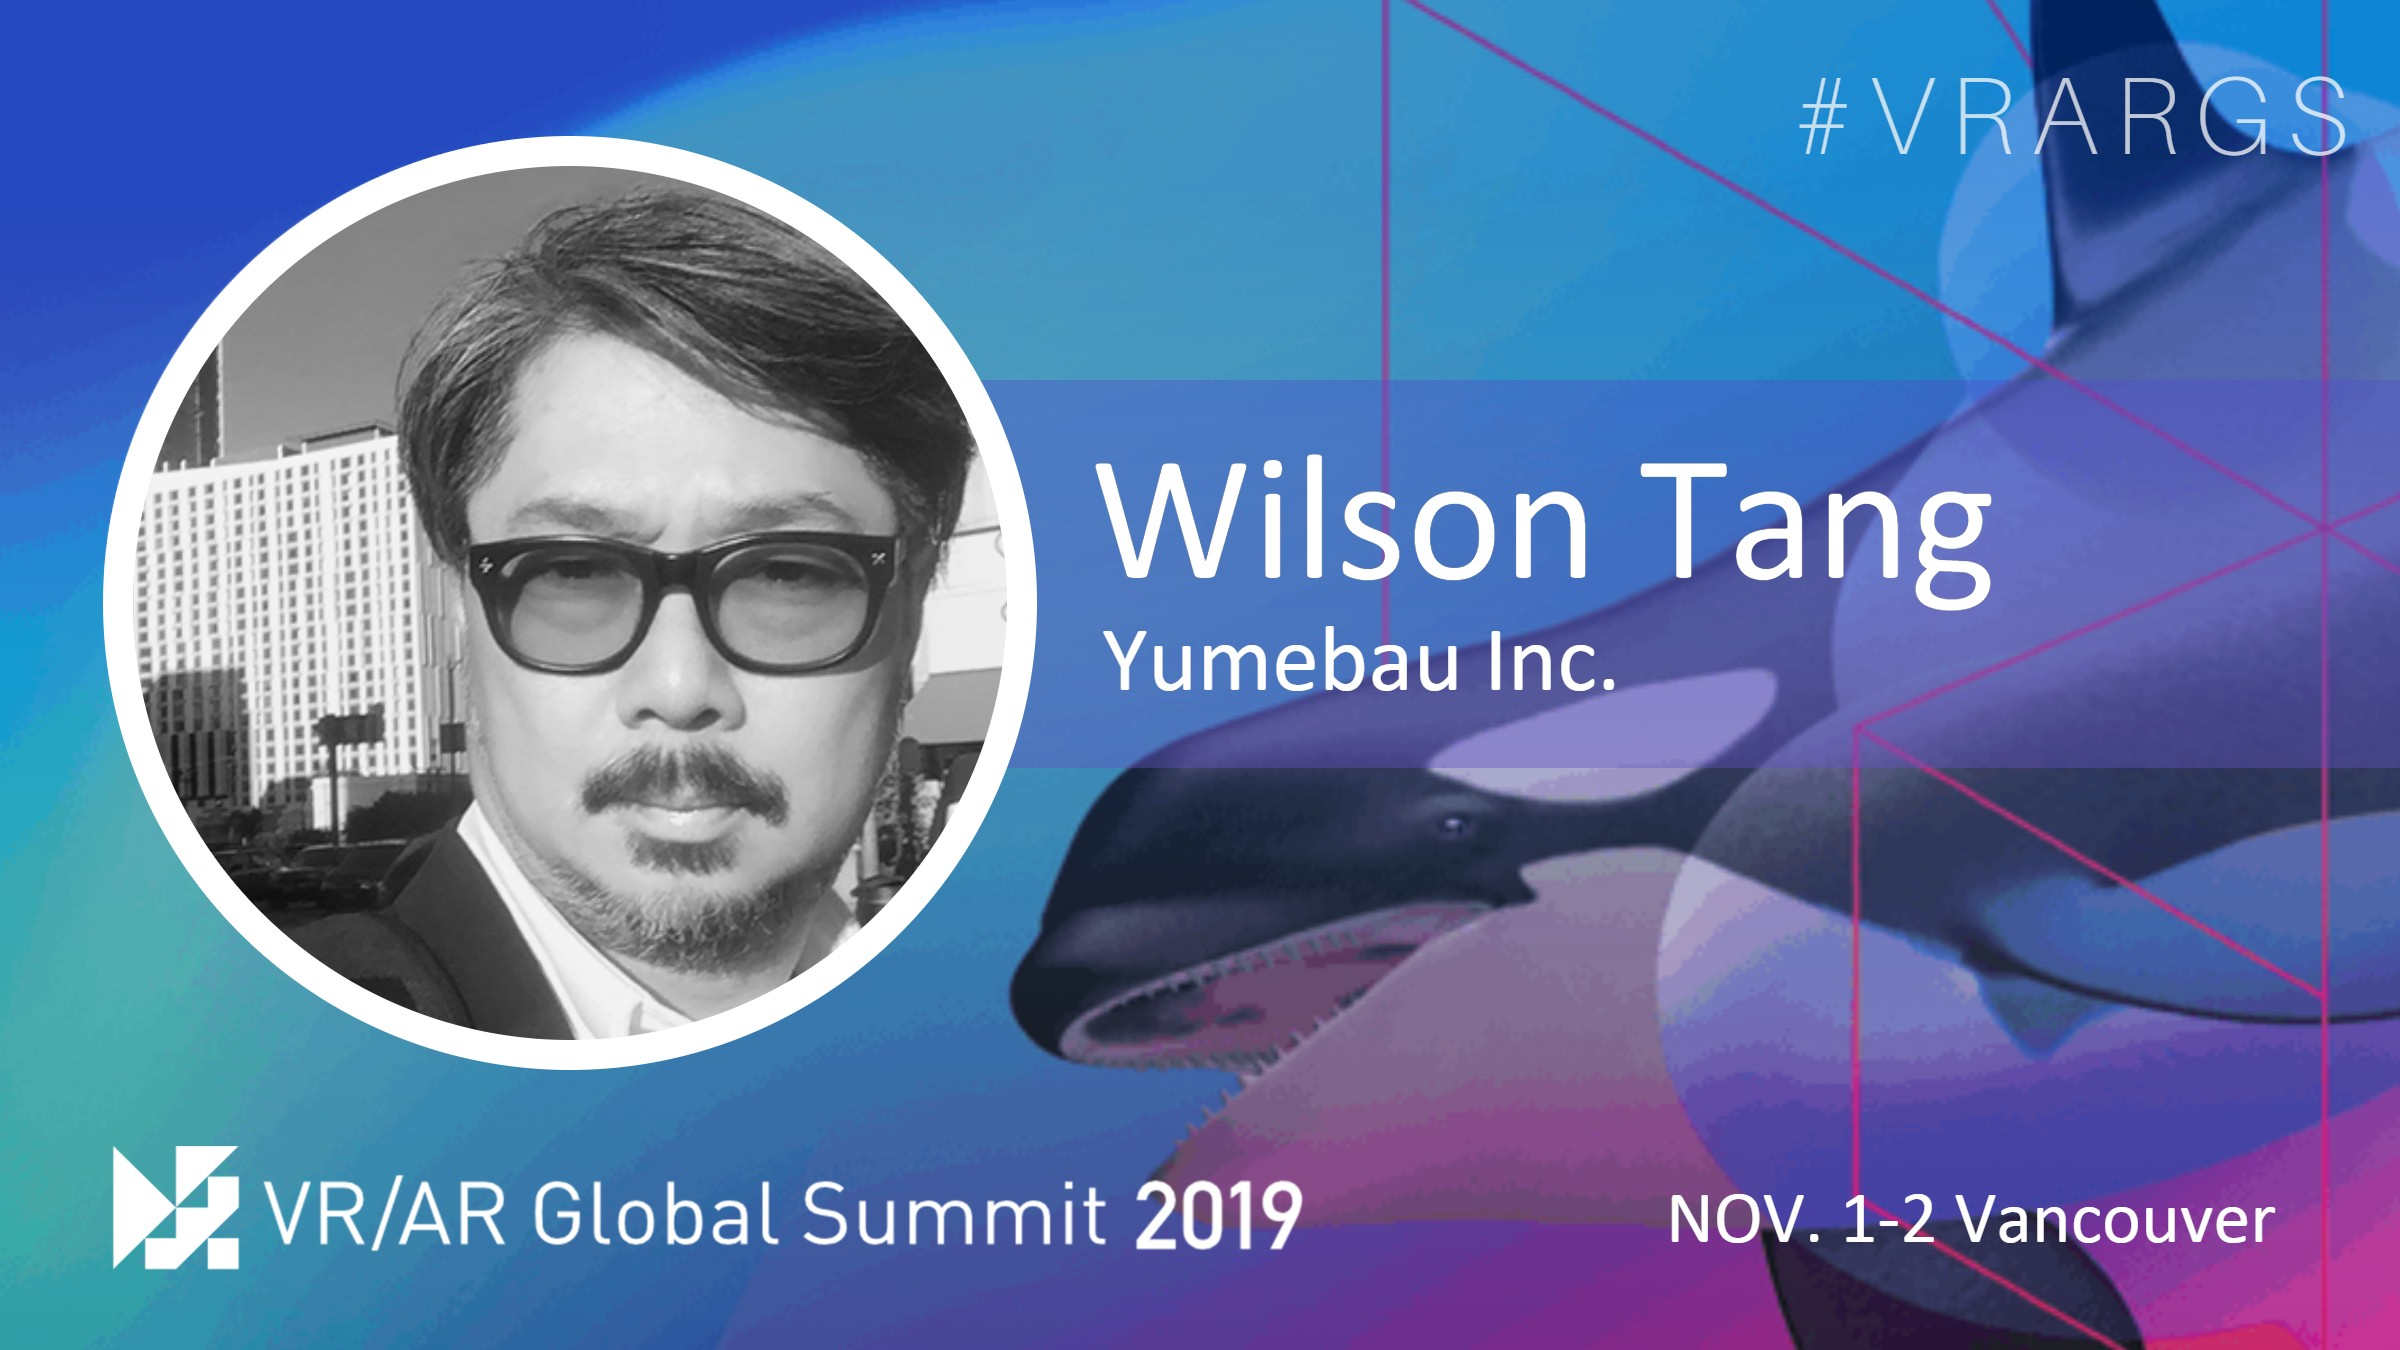 HighRes-Wilson-Tang-Yumebau-Inc-VRARGS-VRAR-Global-Summit-Spatial-Computing-Vancouver.jpg